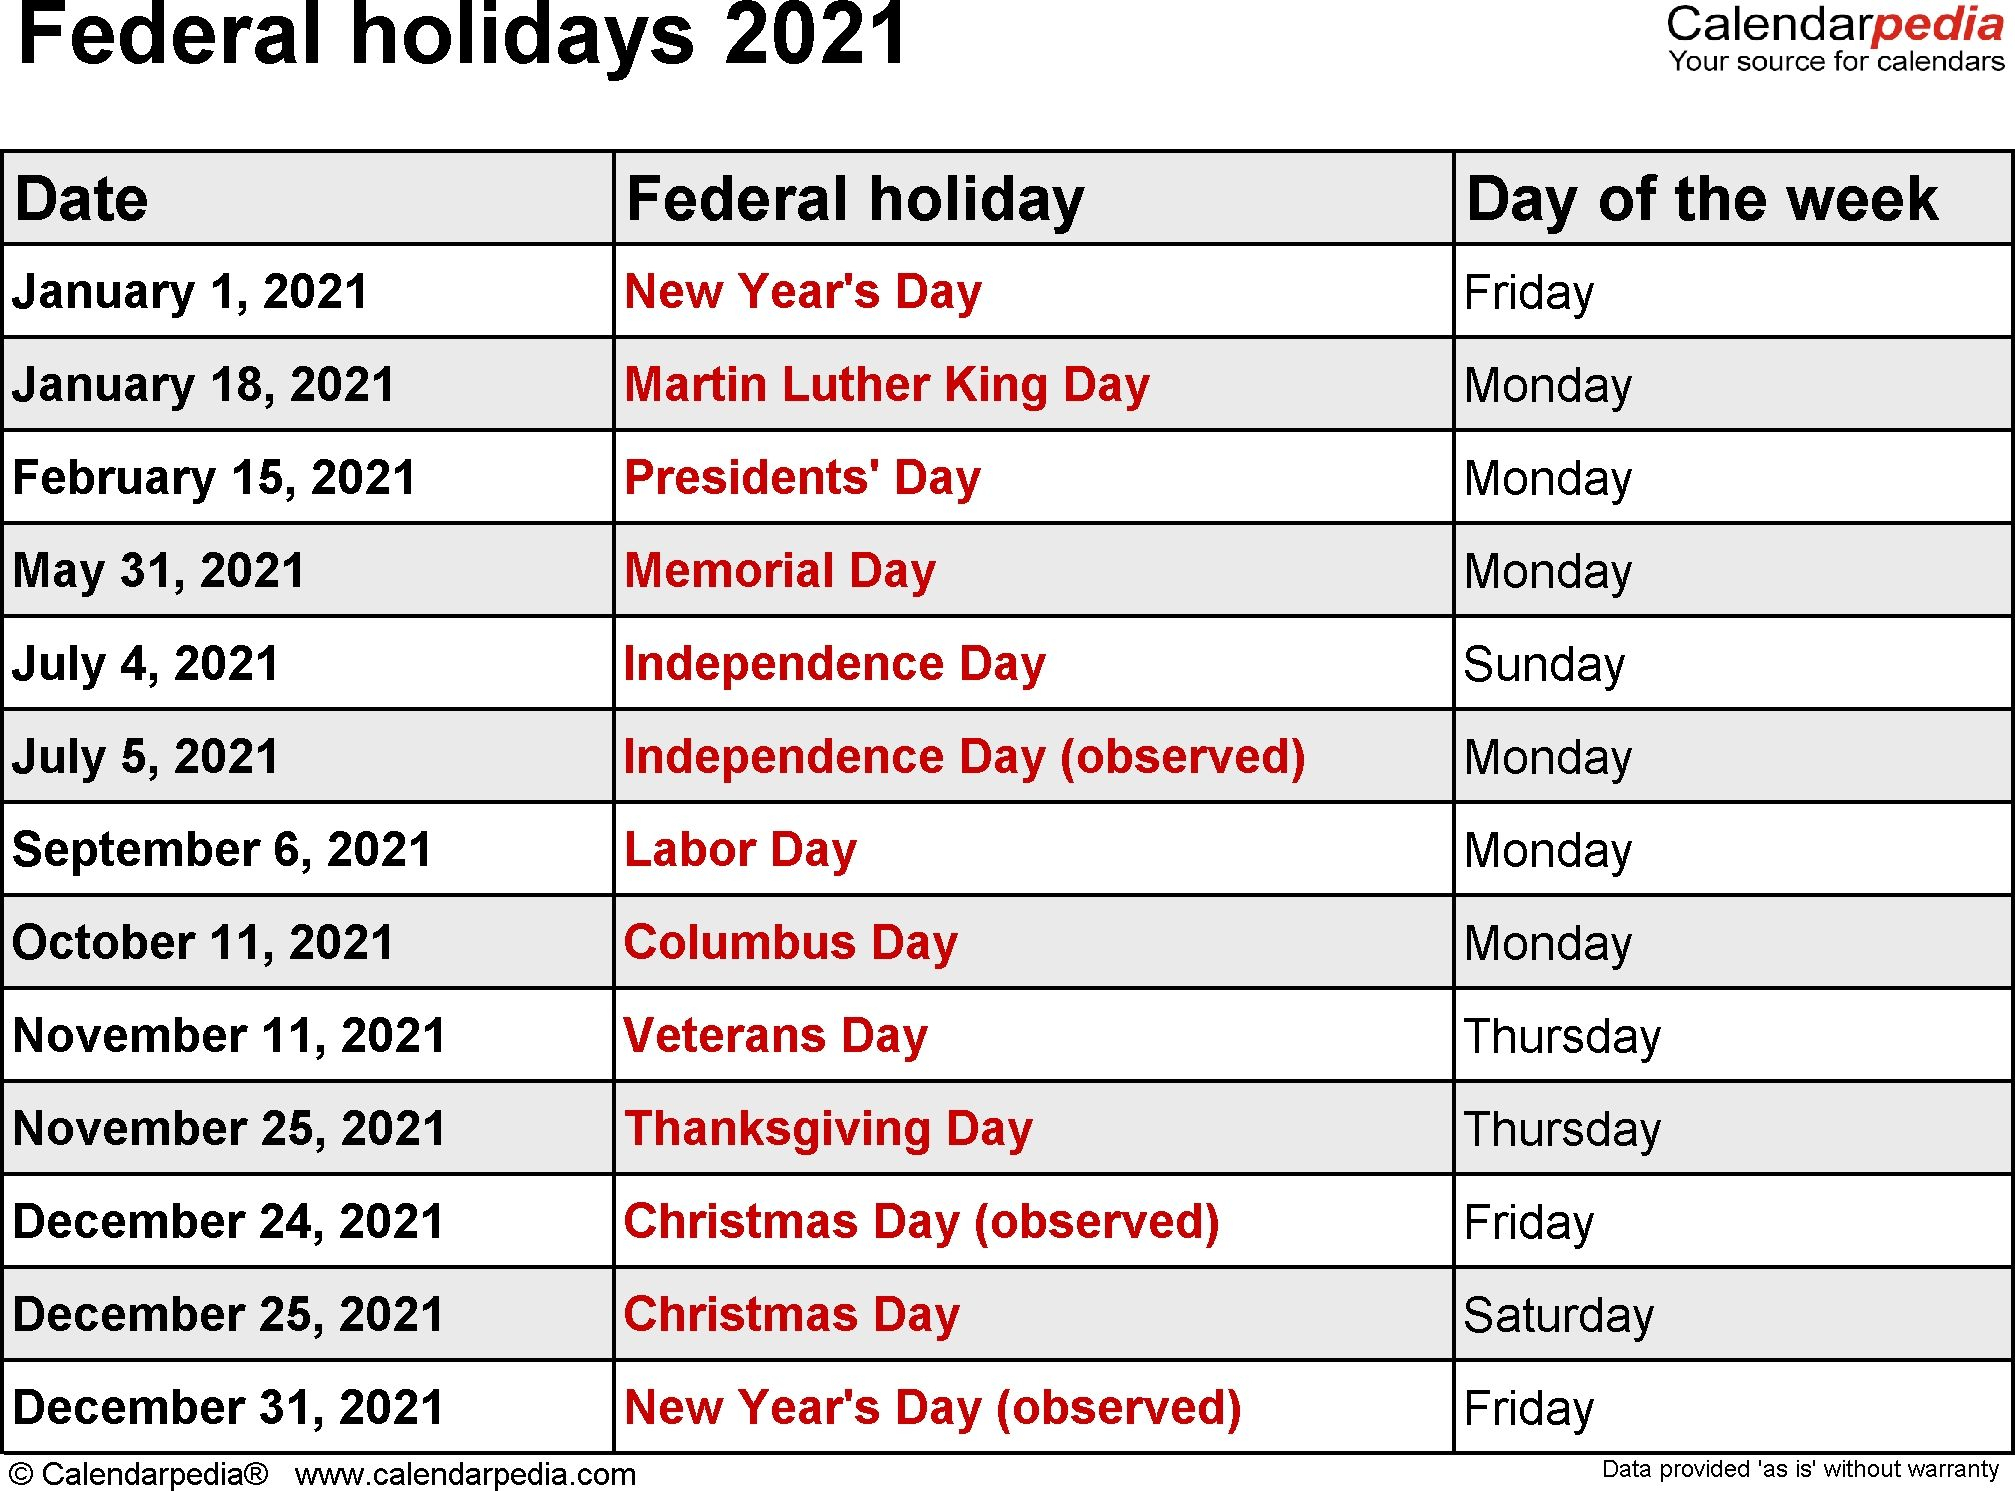 Federal Holidays 2021 Dowload | National Day Calendar